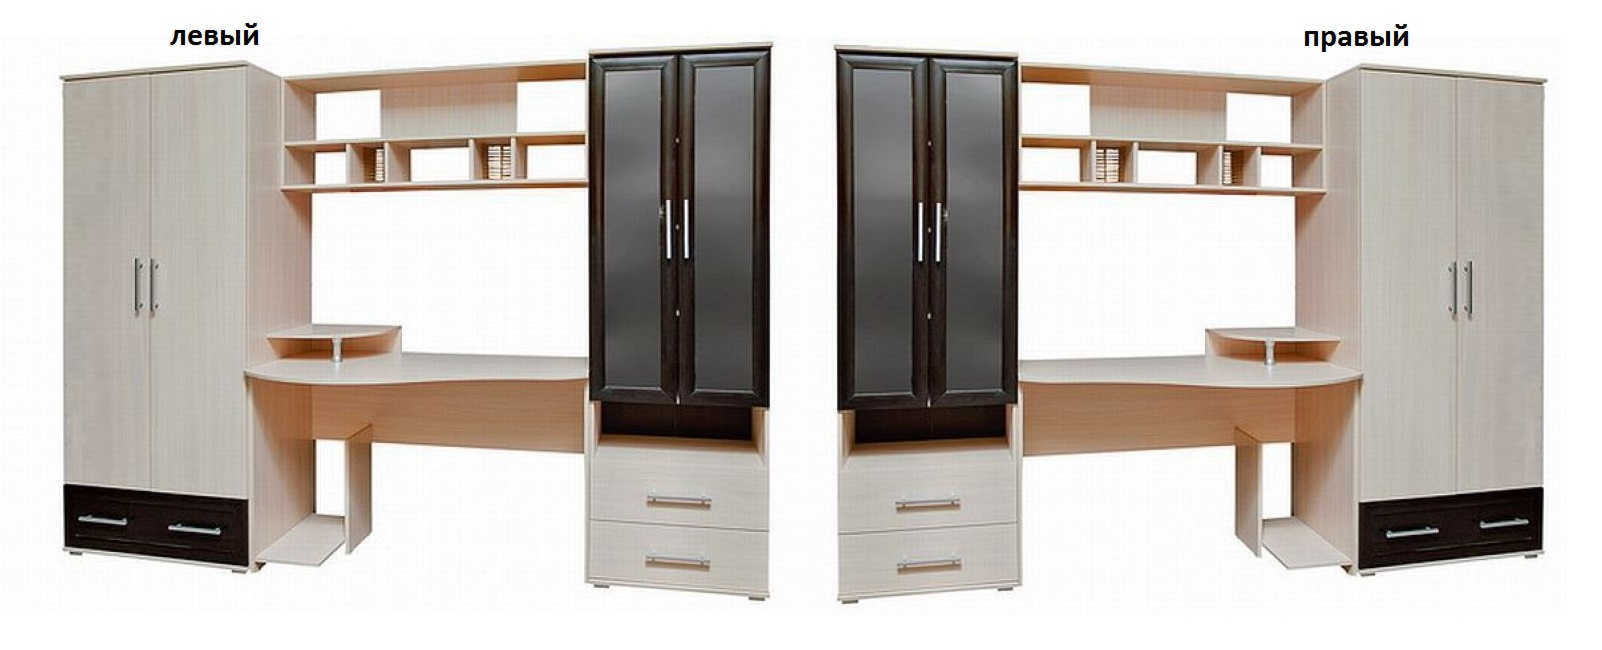 Детская Азарт-2 шкаф слева или справа